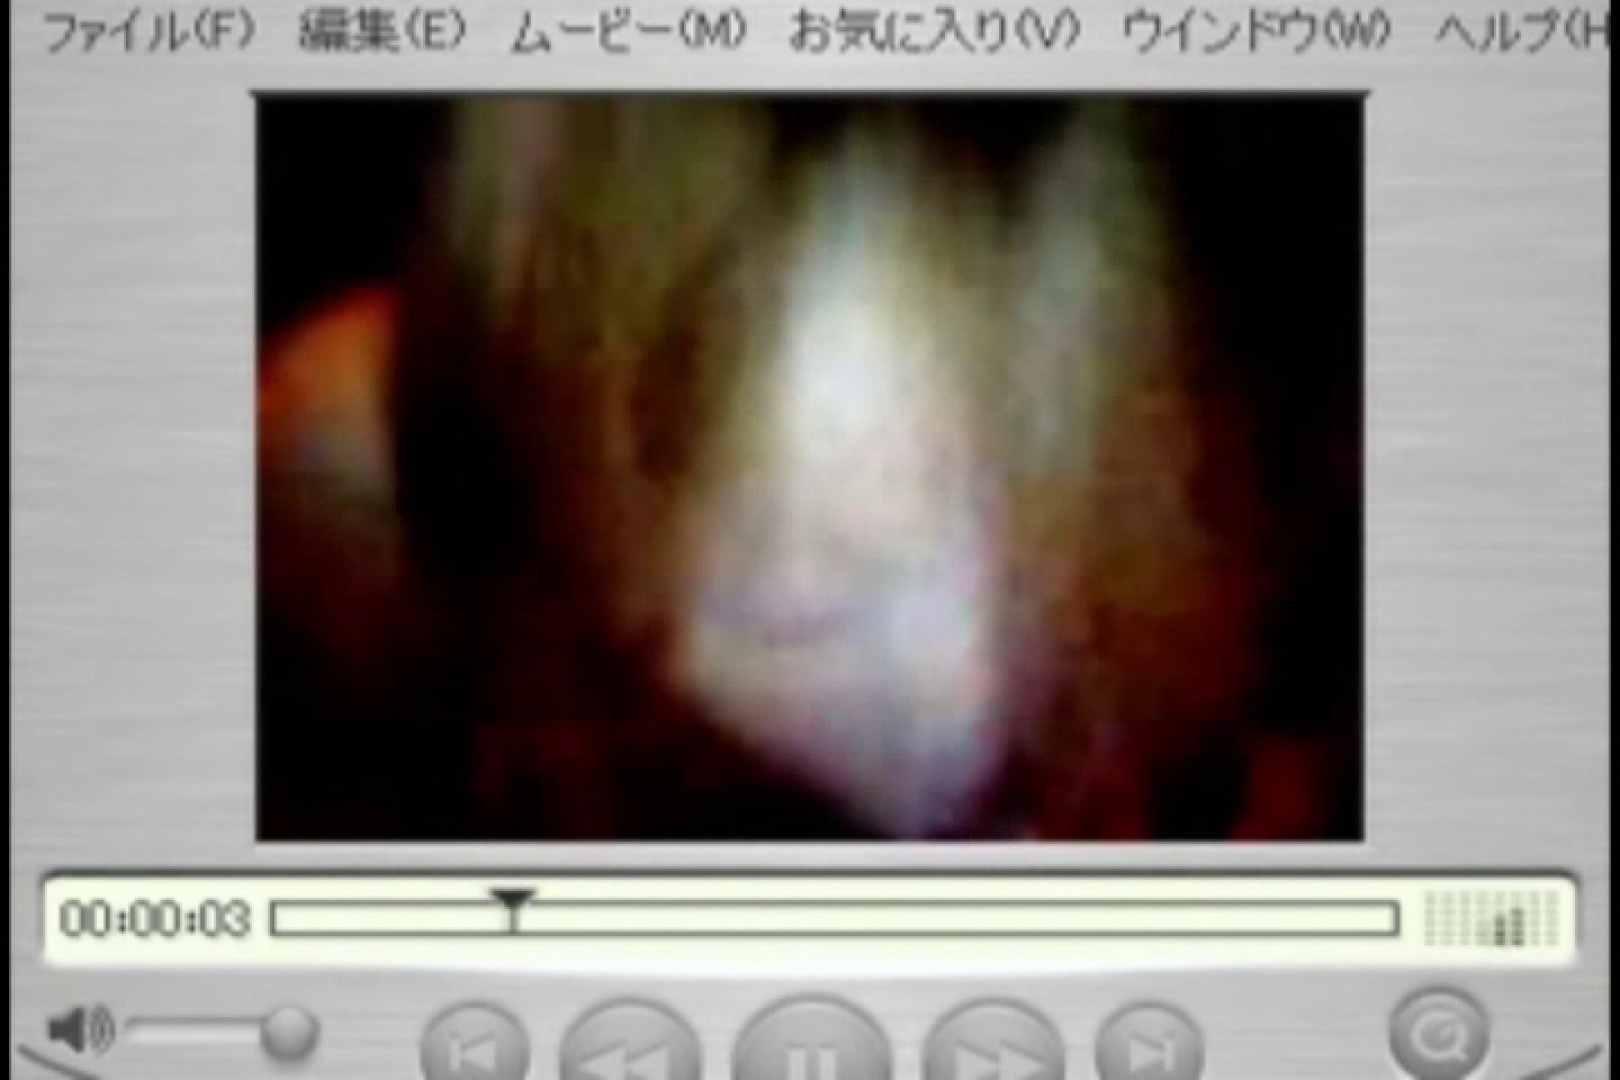 Shigeruのアルバム 流出作品  98pic 34